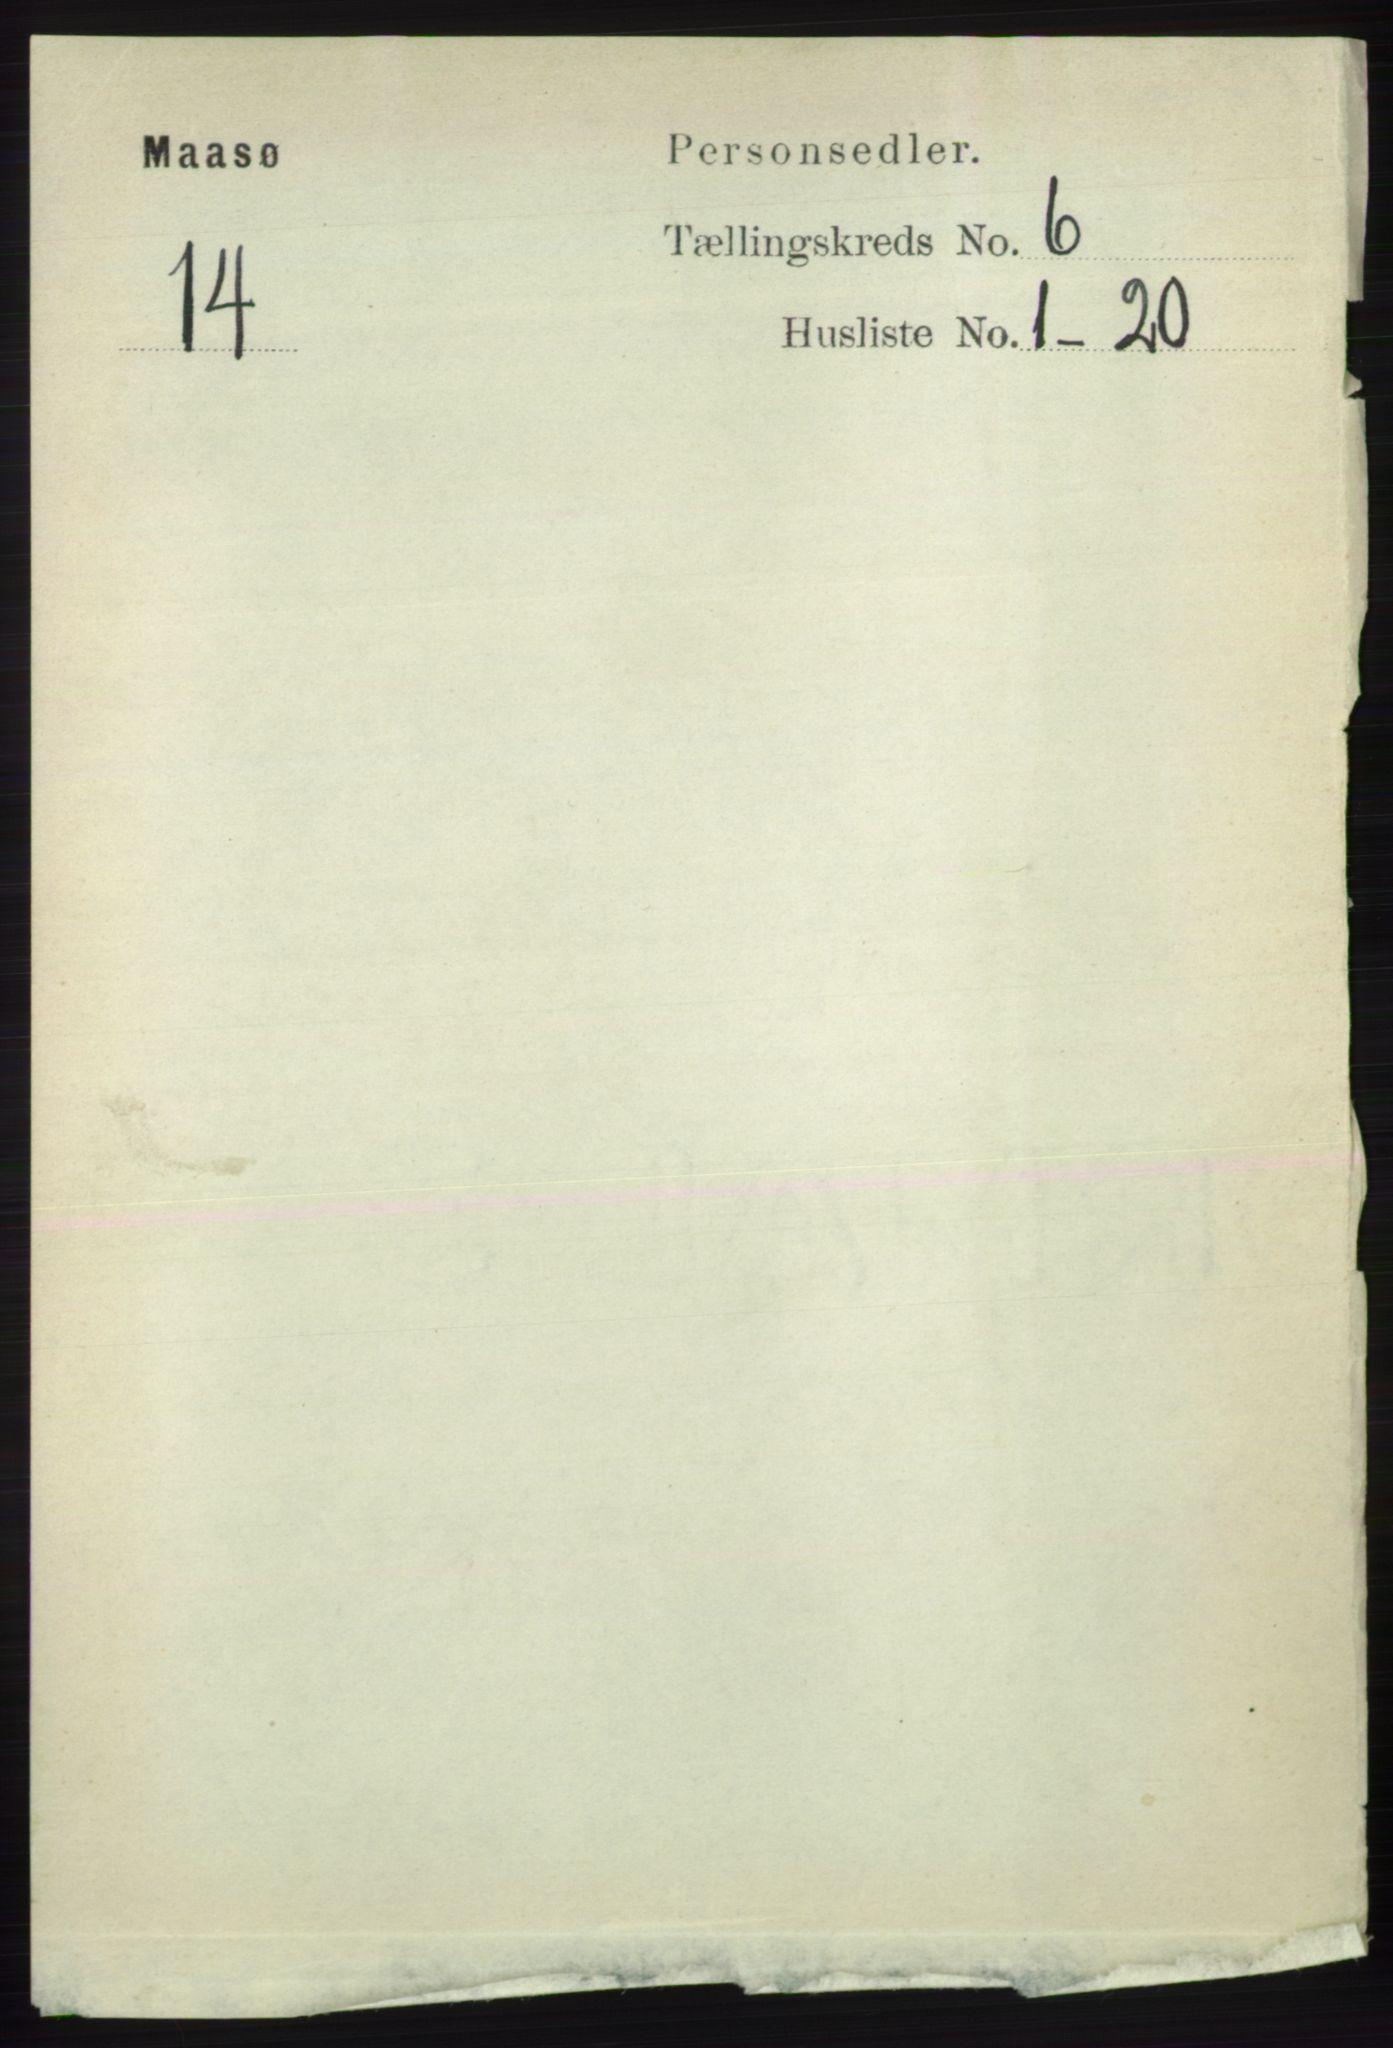 RA, Folketelling 1891 for 2018 Måsøy herred, 1891, s. 1121